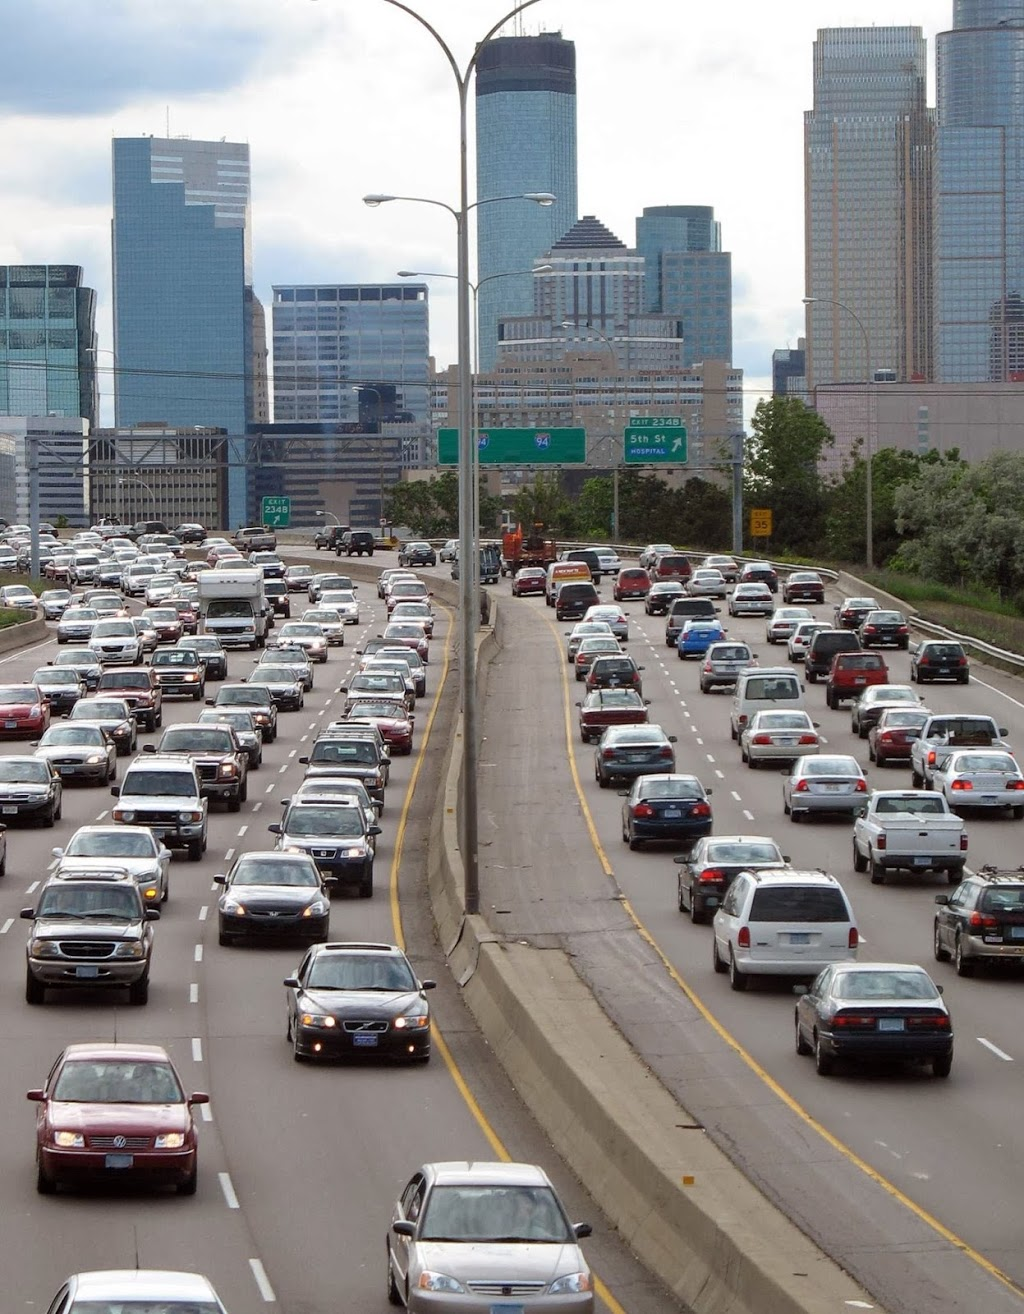 San Antonio Auto Insurance   insurance agency   200 E Market St, San Antonio, TX 78205, USA   2102013111 OR +1 210-201-3111